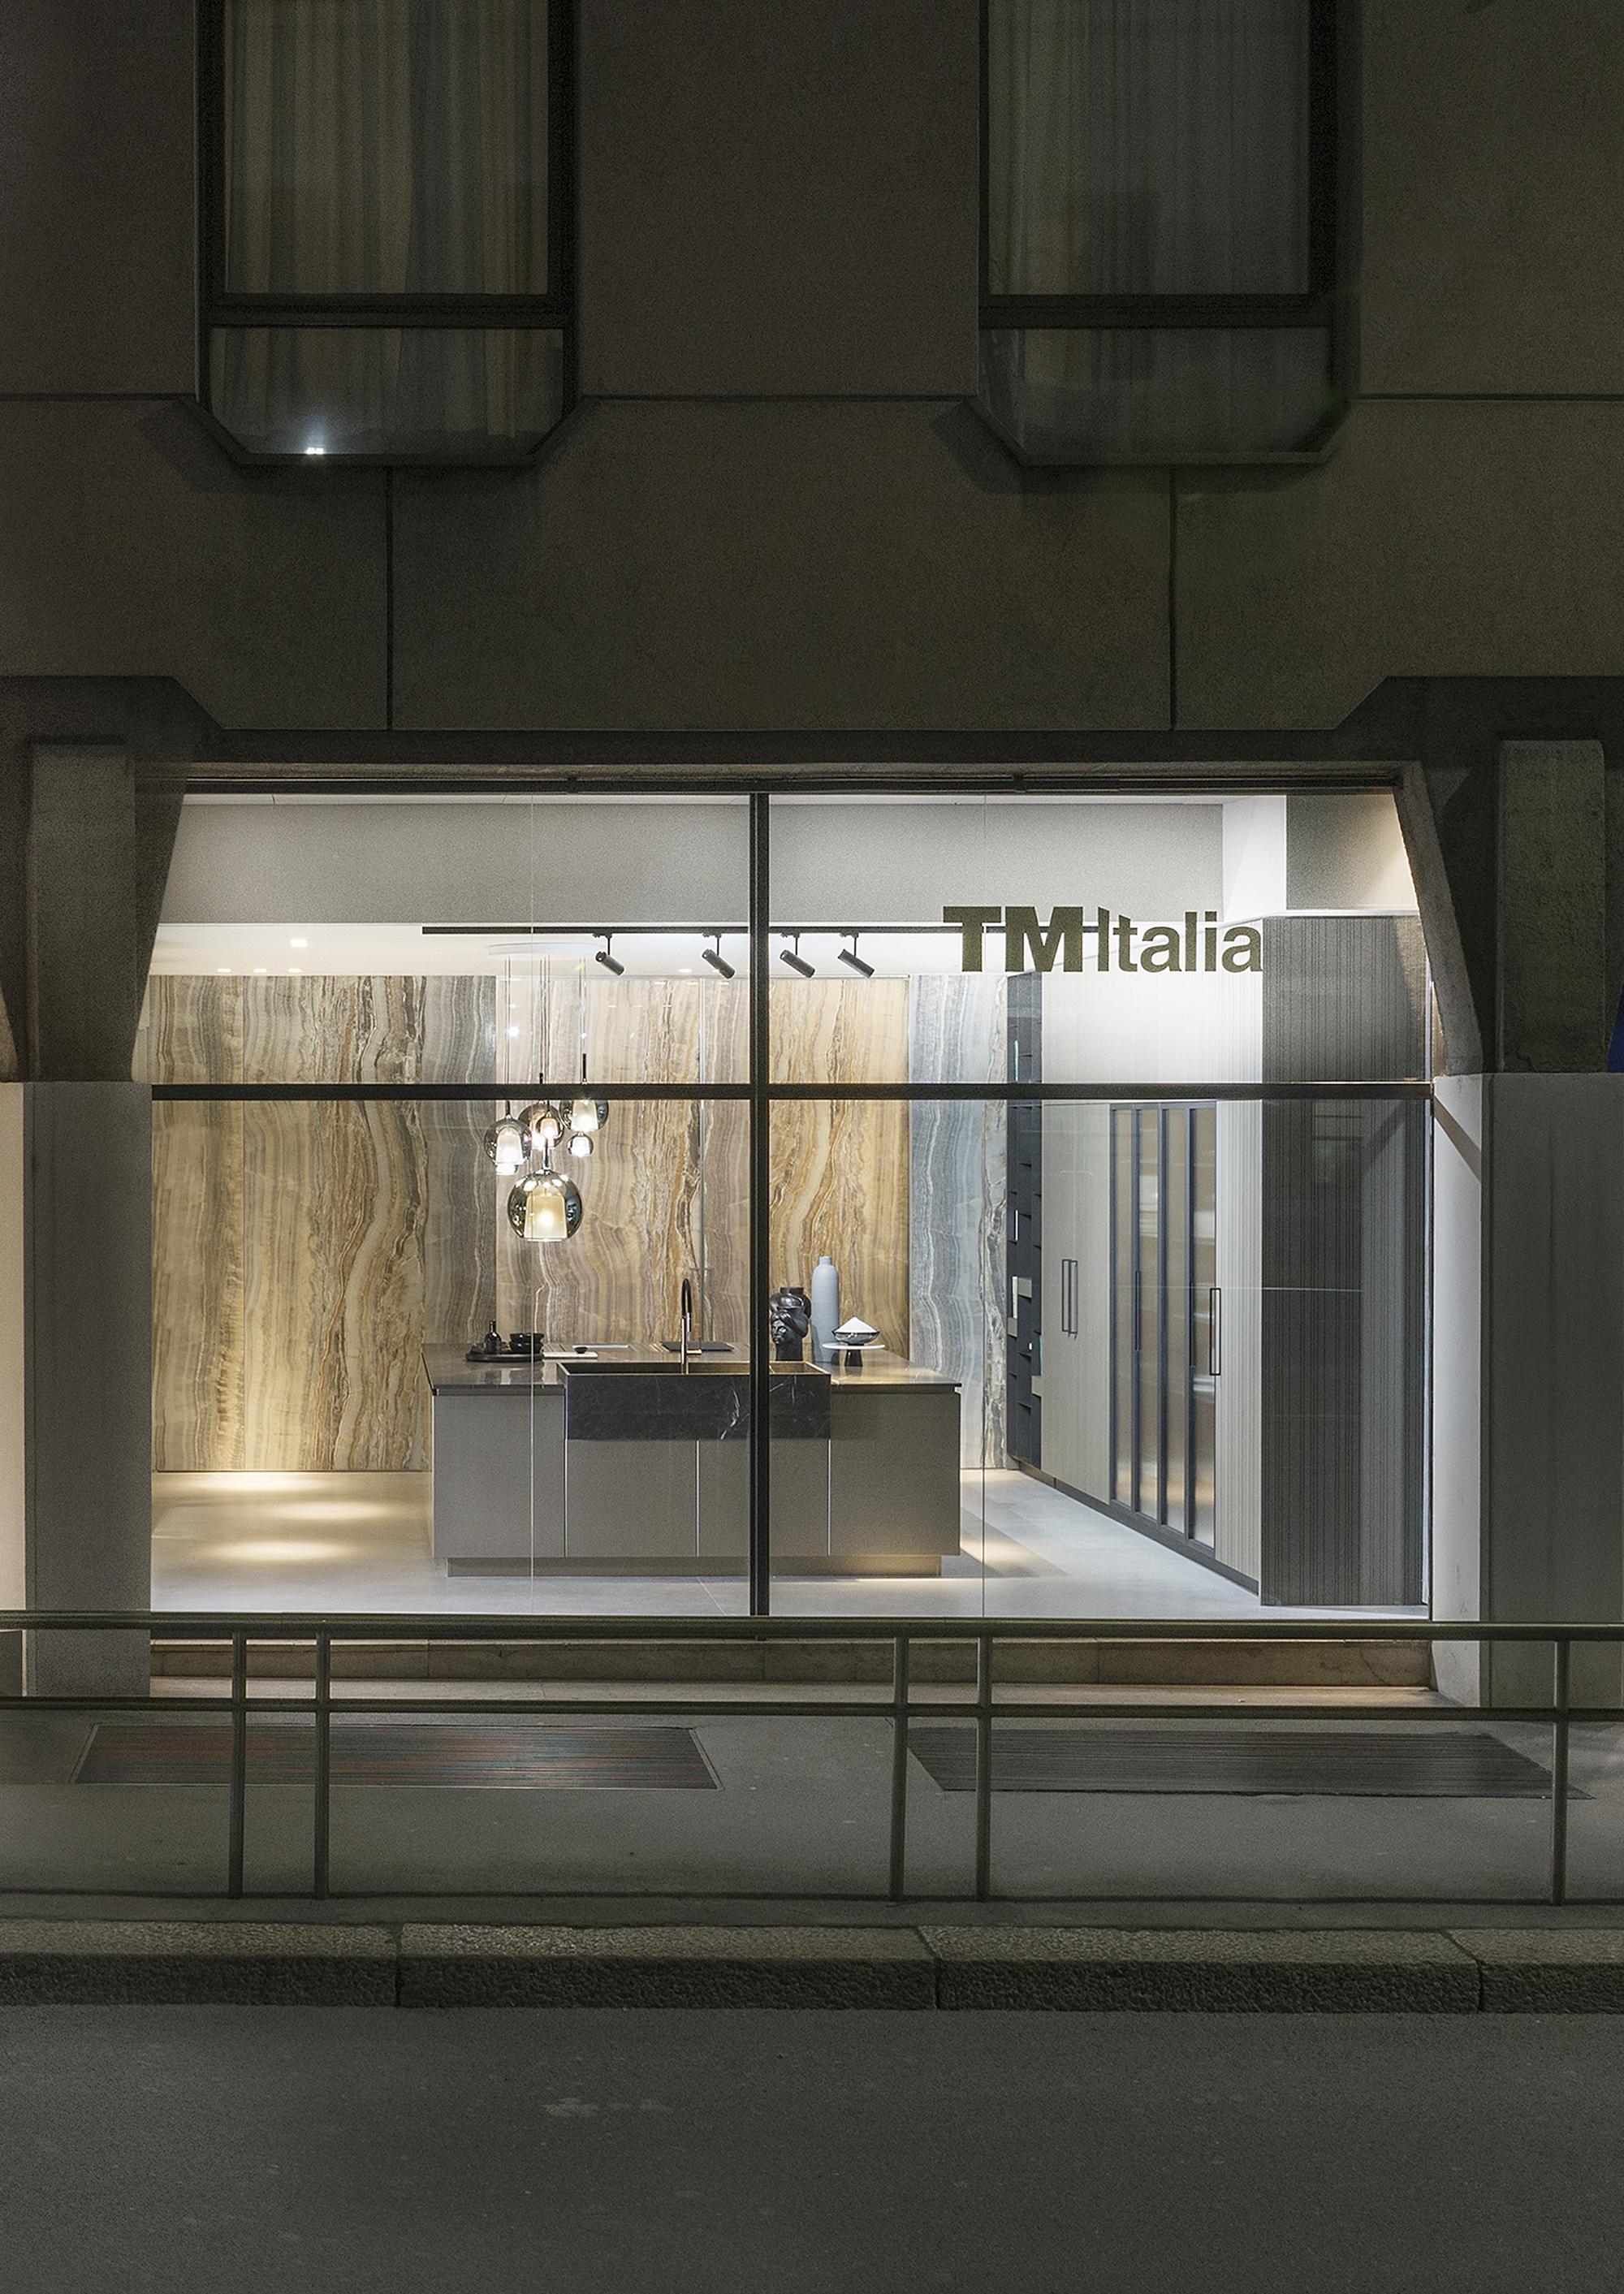 Via Larga 3. In Milan, TM Italia lives a new exhibition space dedicated to high Italian design. - TM_MI19_Vetrina-T45-Rua-copy